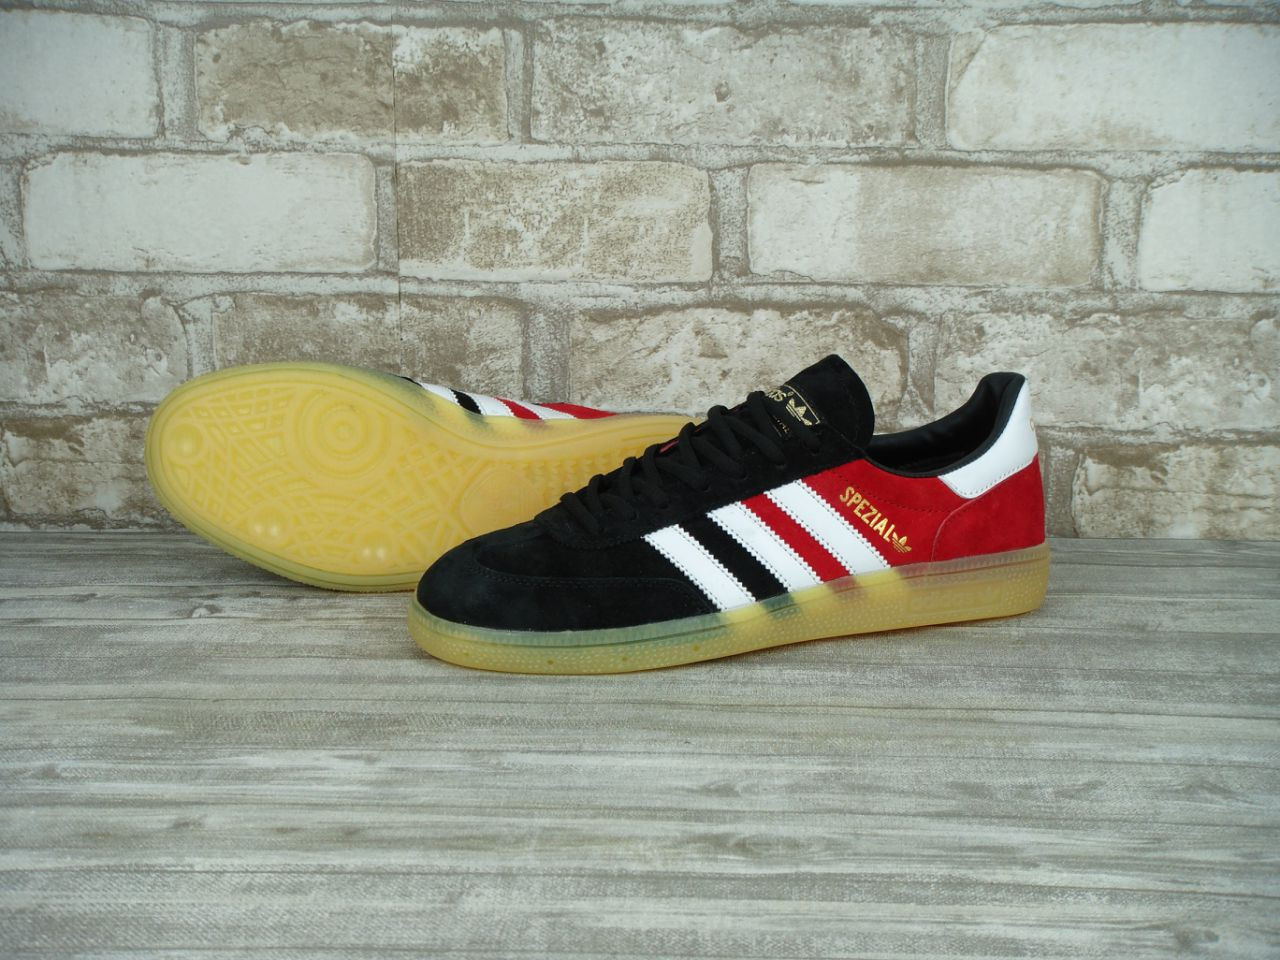 Кроссовки Adidas Spezial Red Black White